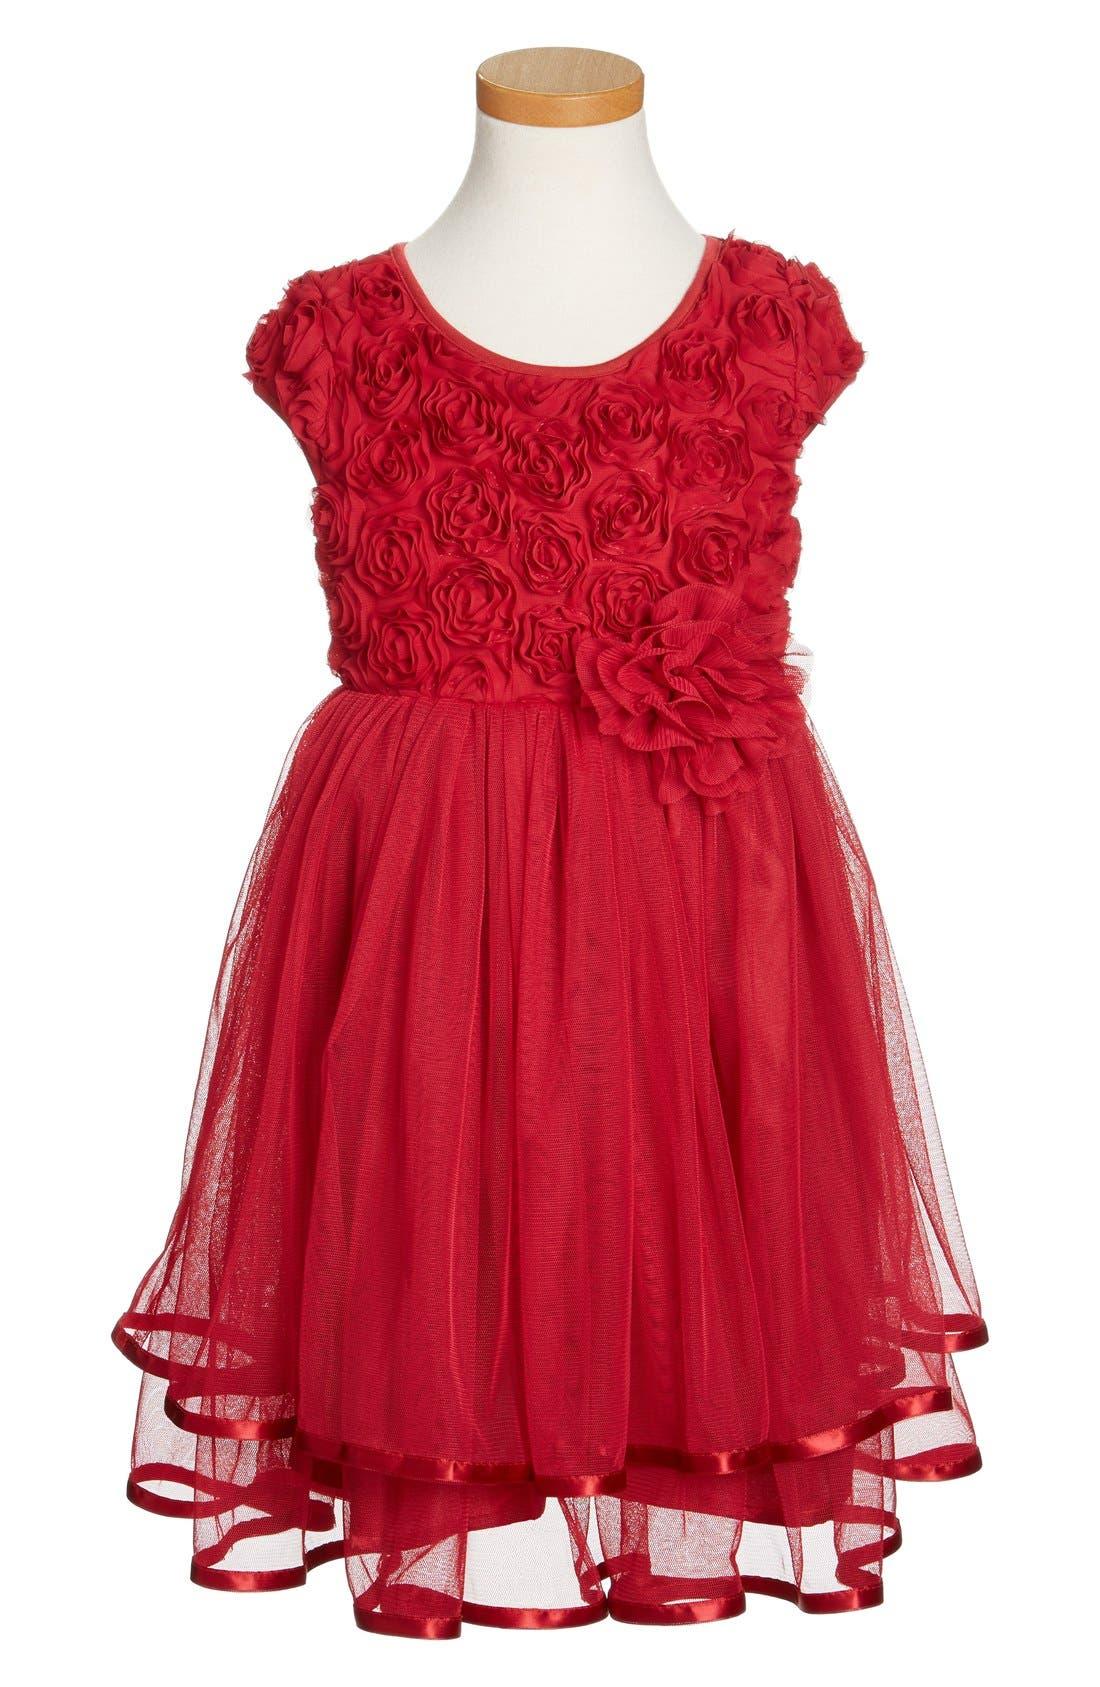 Girls Popatu Ribbon Rosette Tulle Dress Size 8  Red